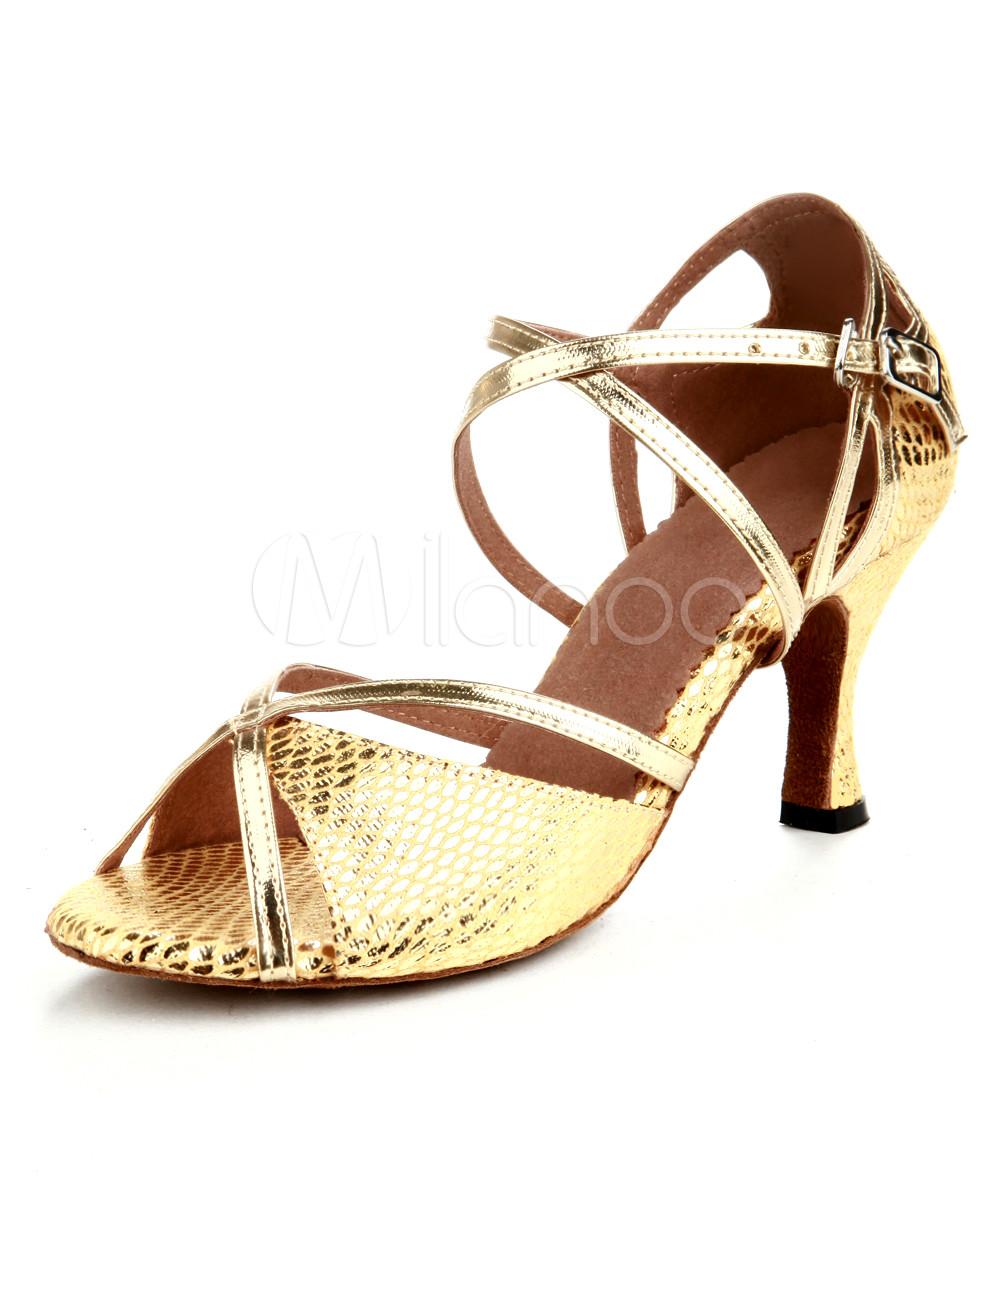 Zapatos de bailes latinos de PU dorado Footlocker Barato Online fVWI9I